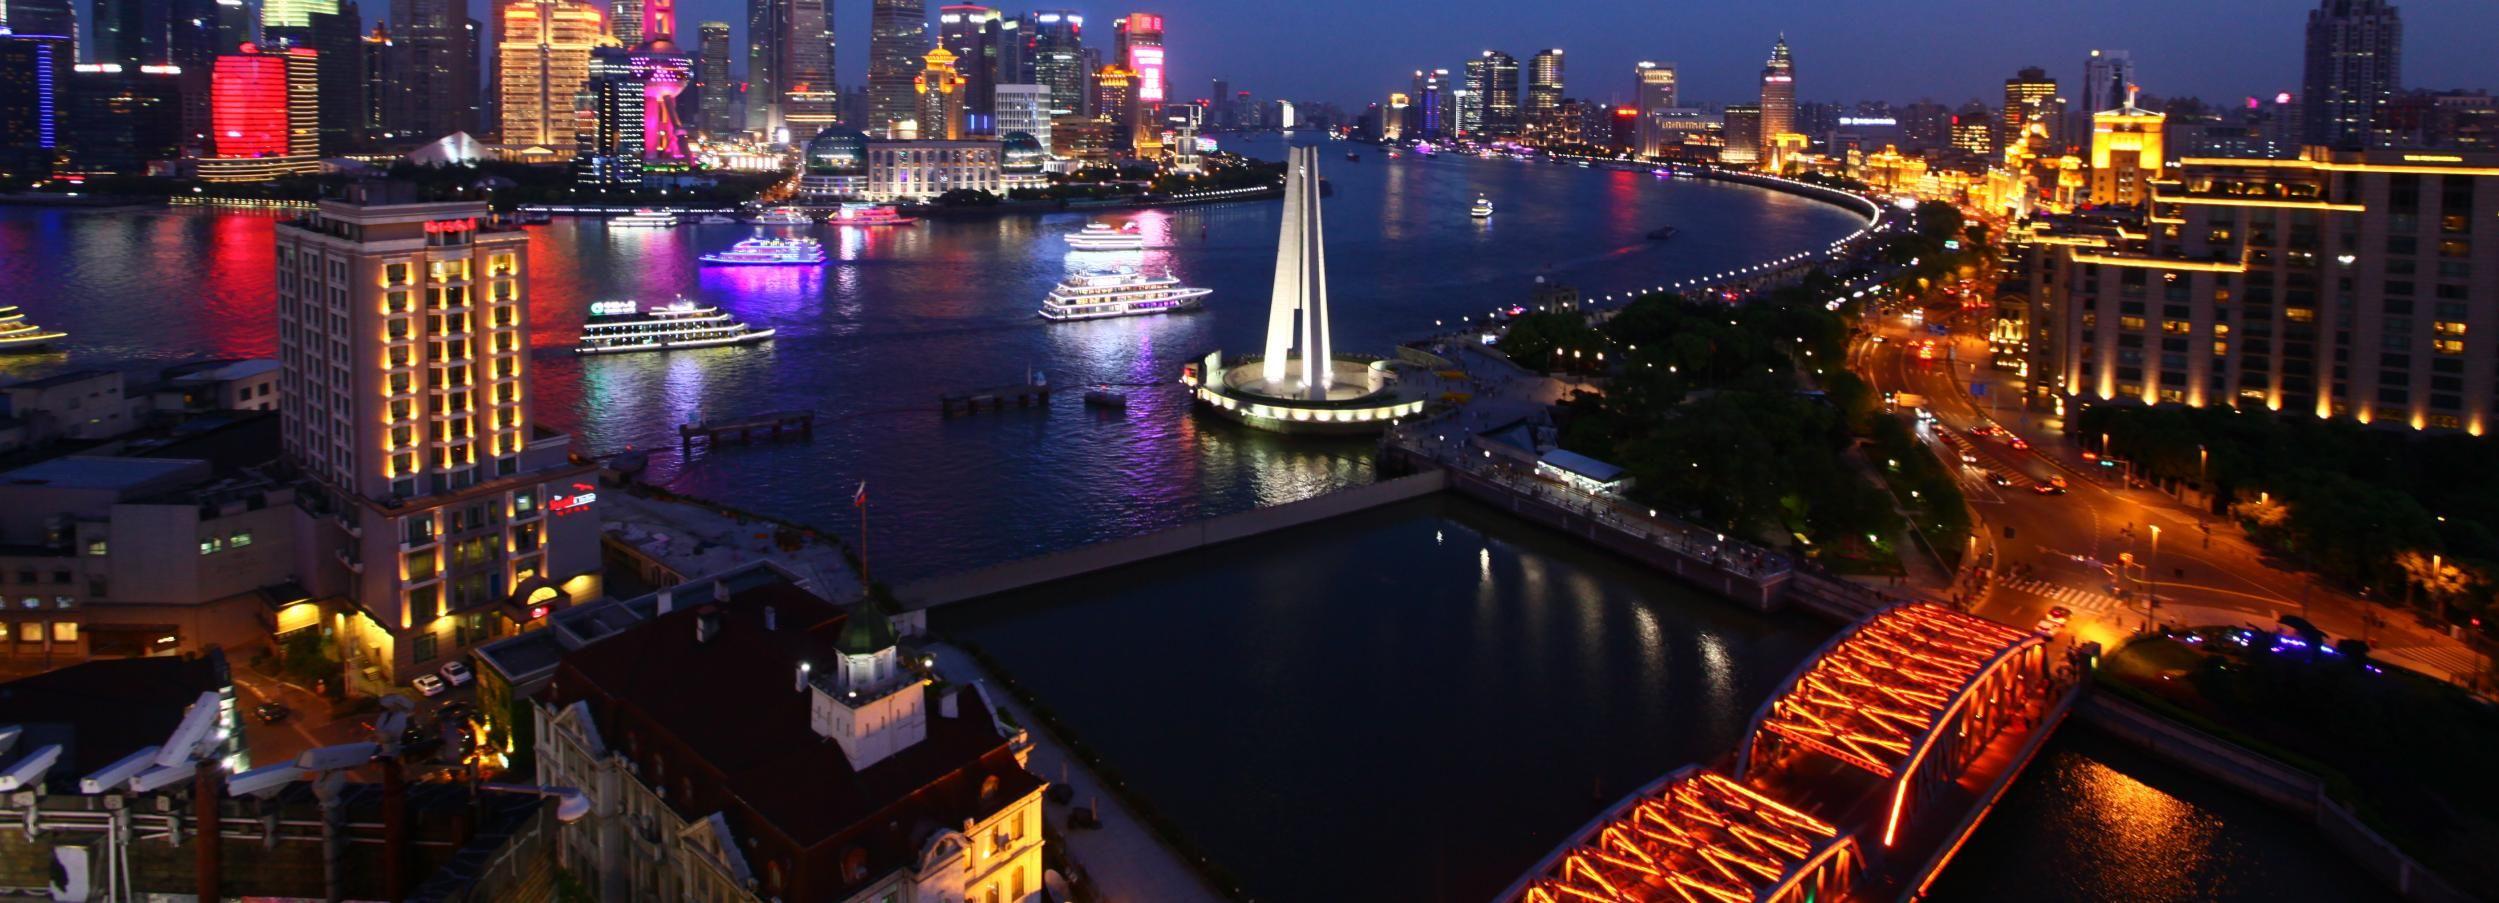 Shanghai: City Lights and Huangpu River Cruise Night Tour